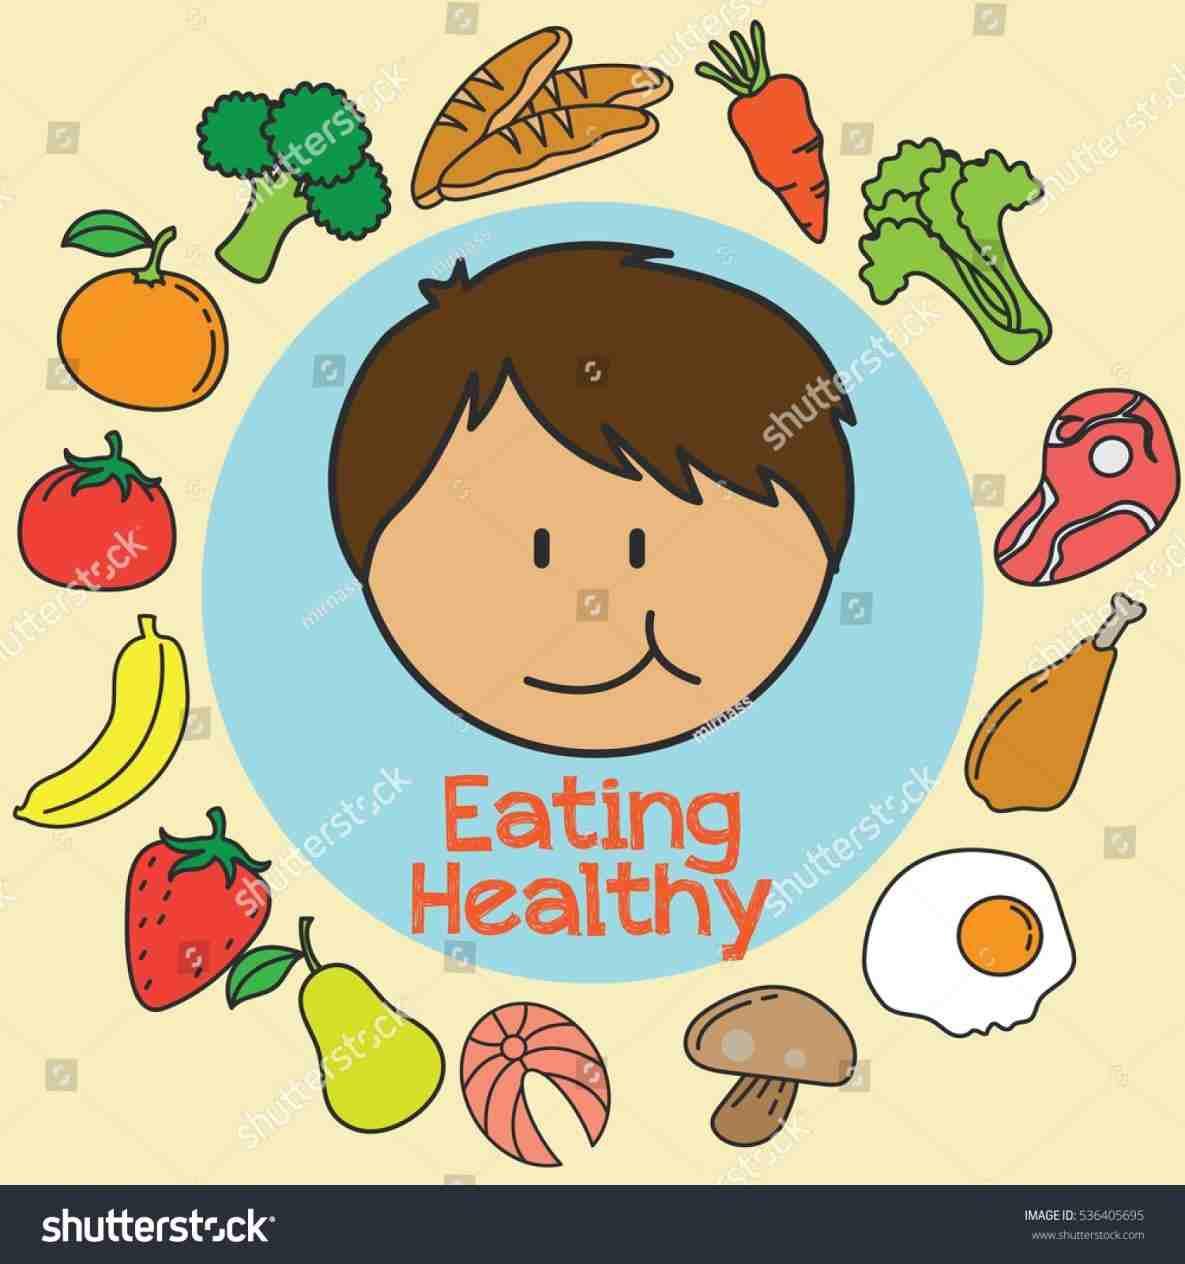 Children rhyoutubecom nutrition Kids Eating Healthy Foods.